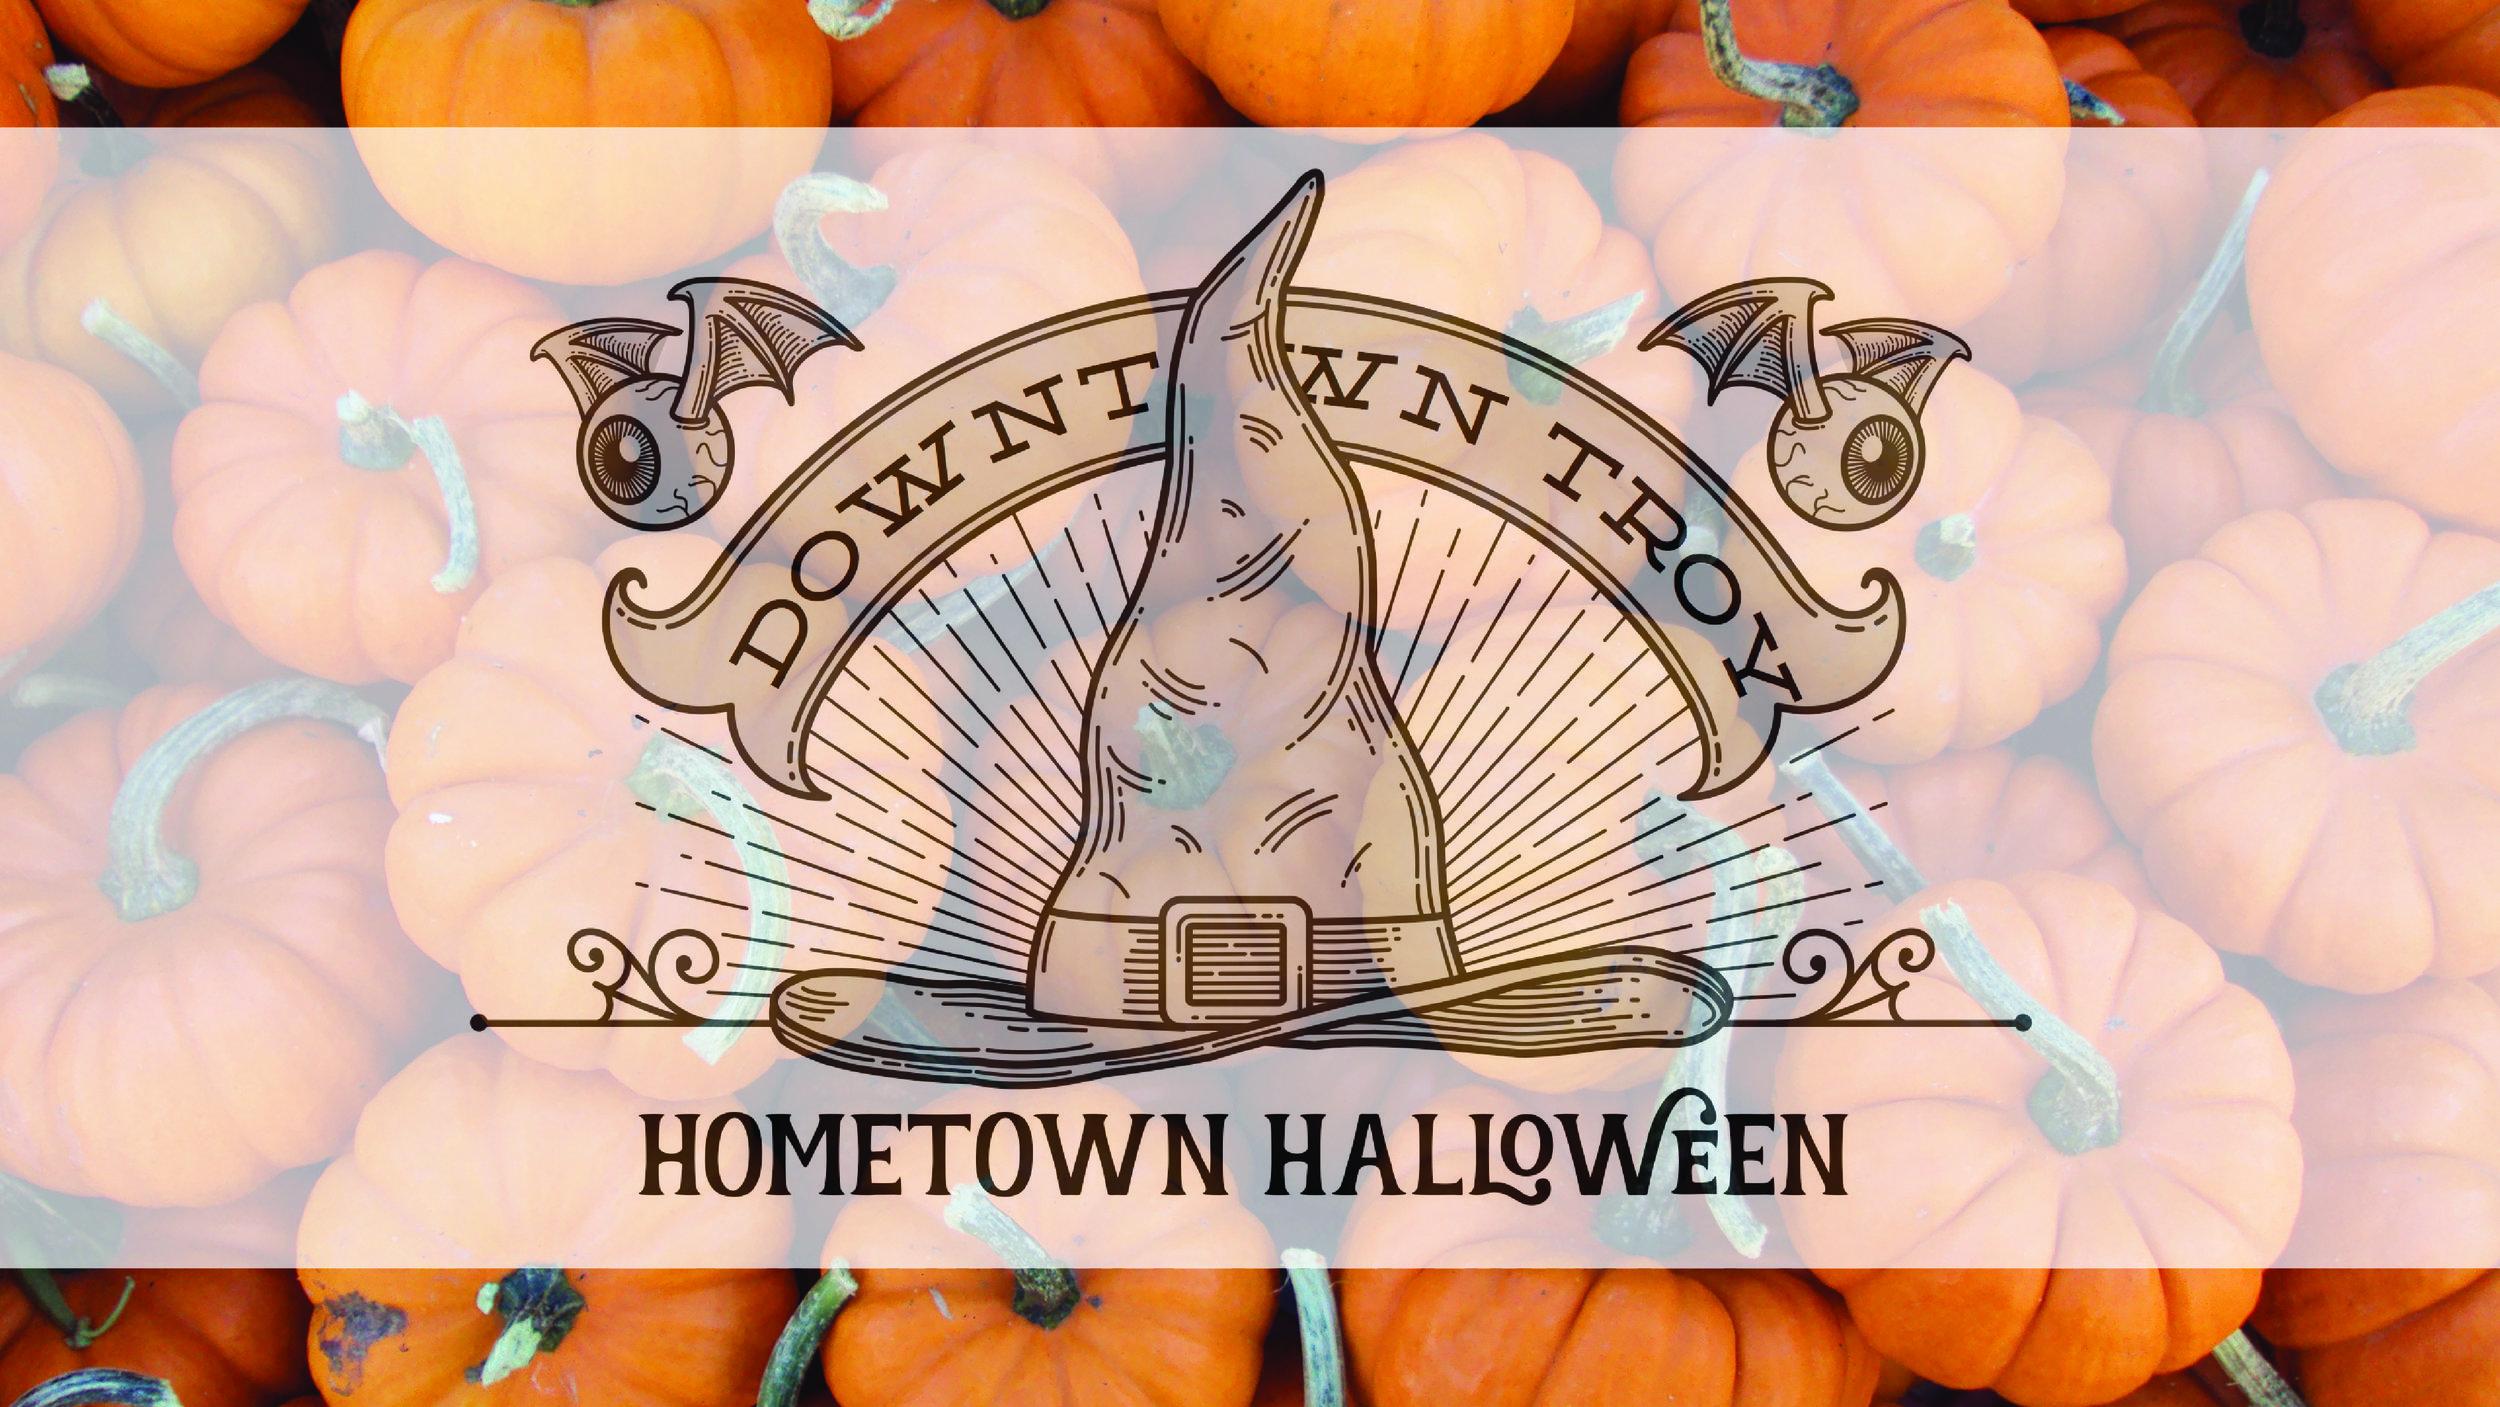 Hometown Halloween Banner.jpg